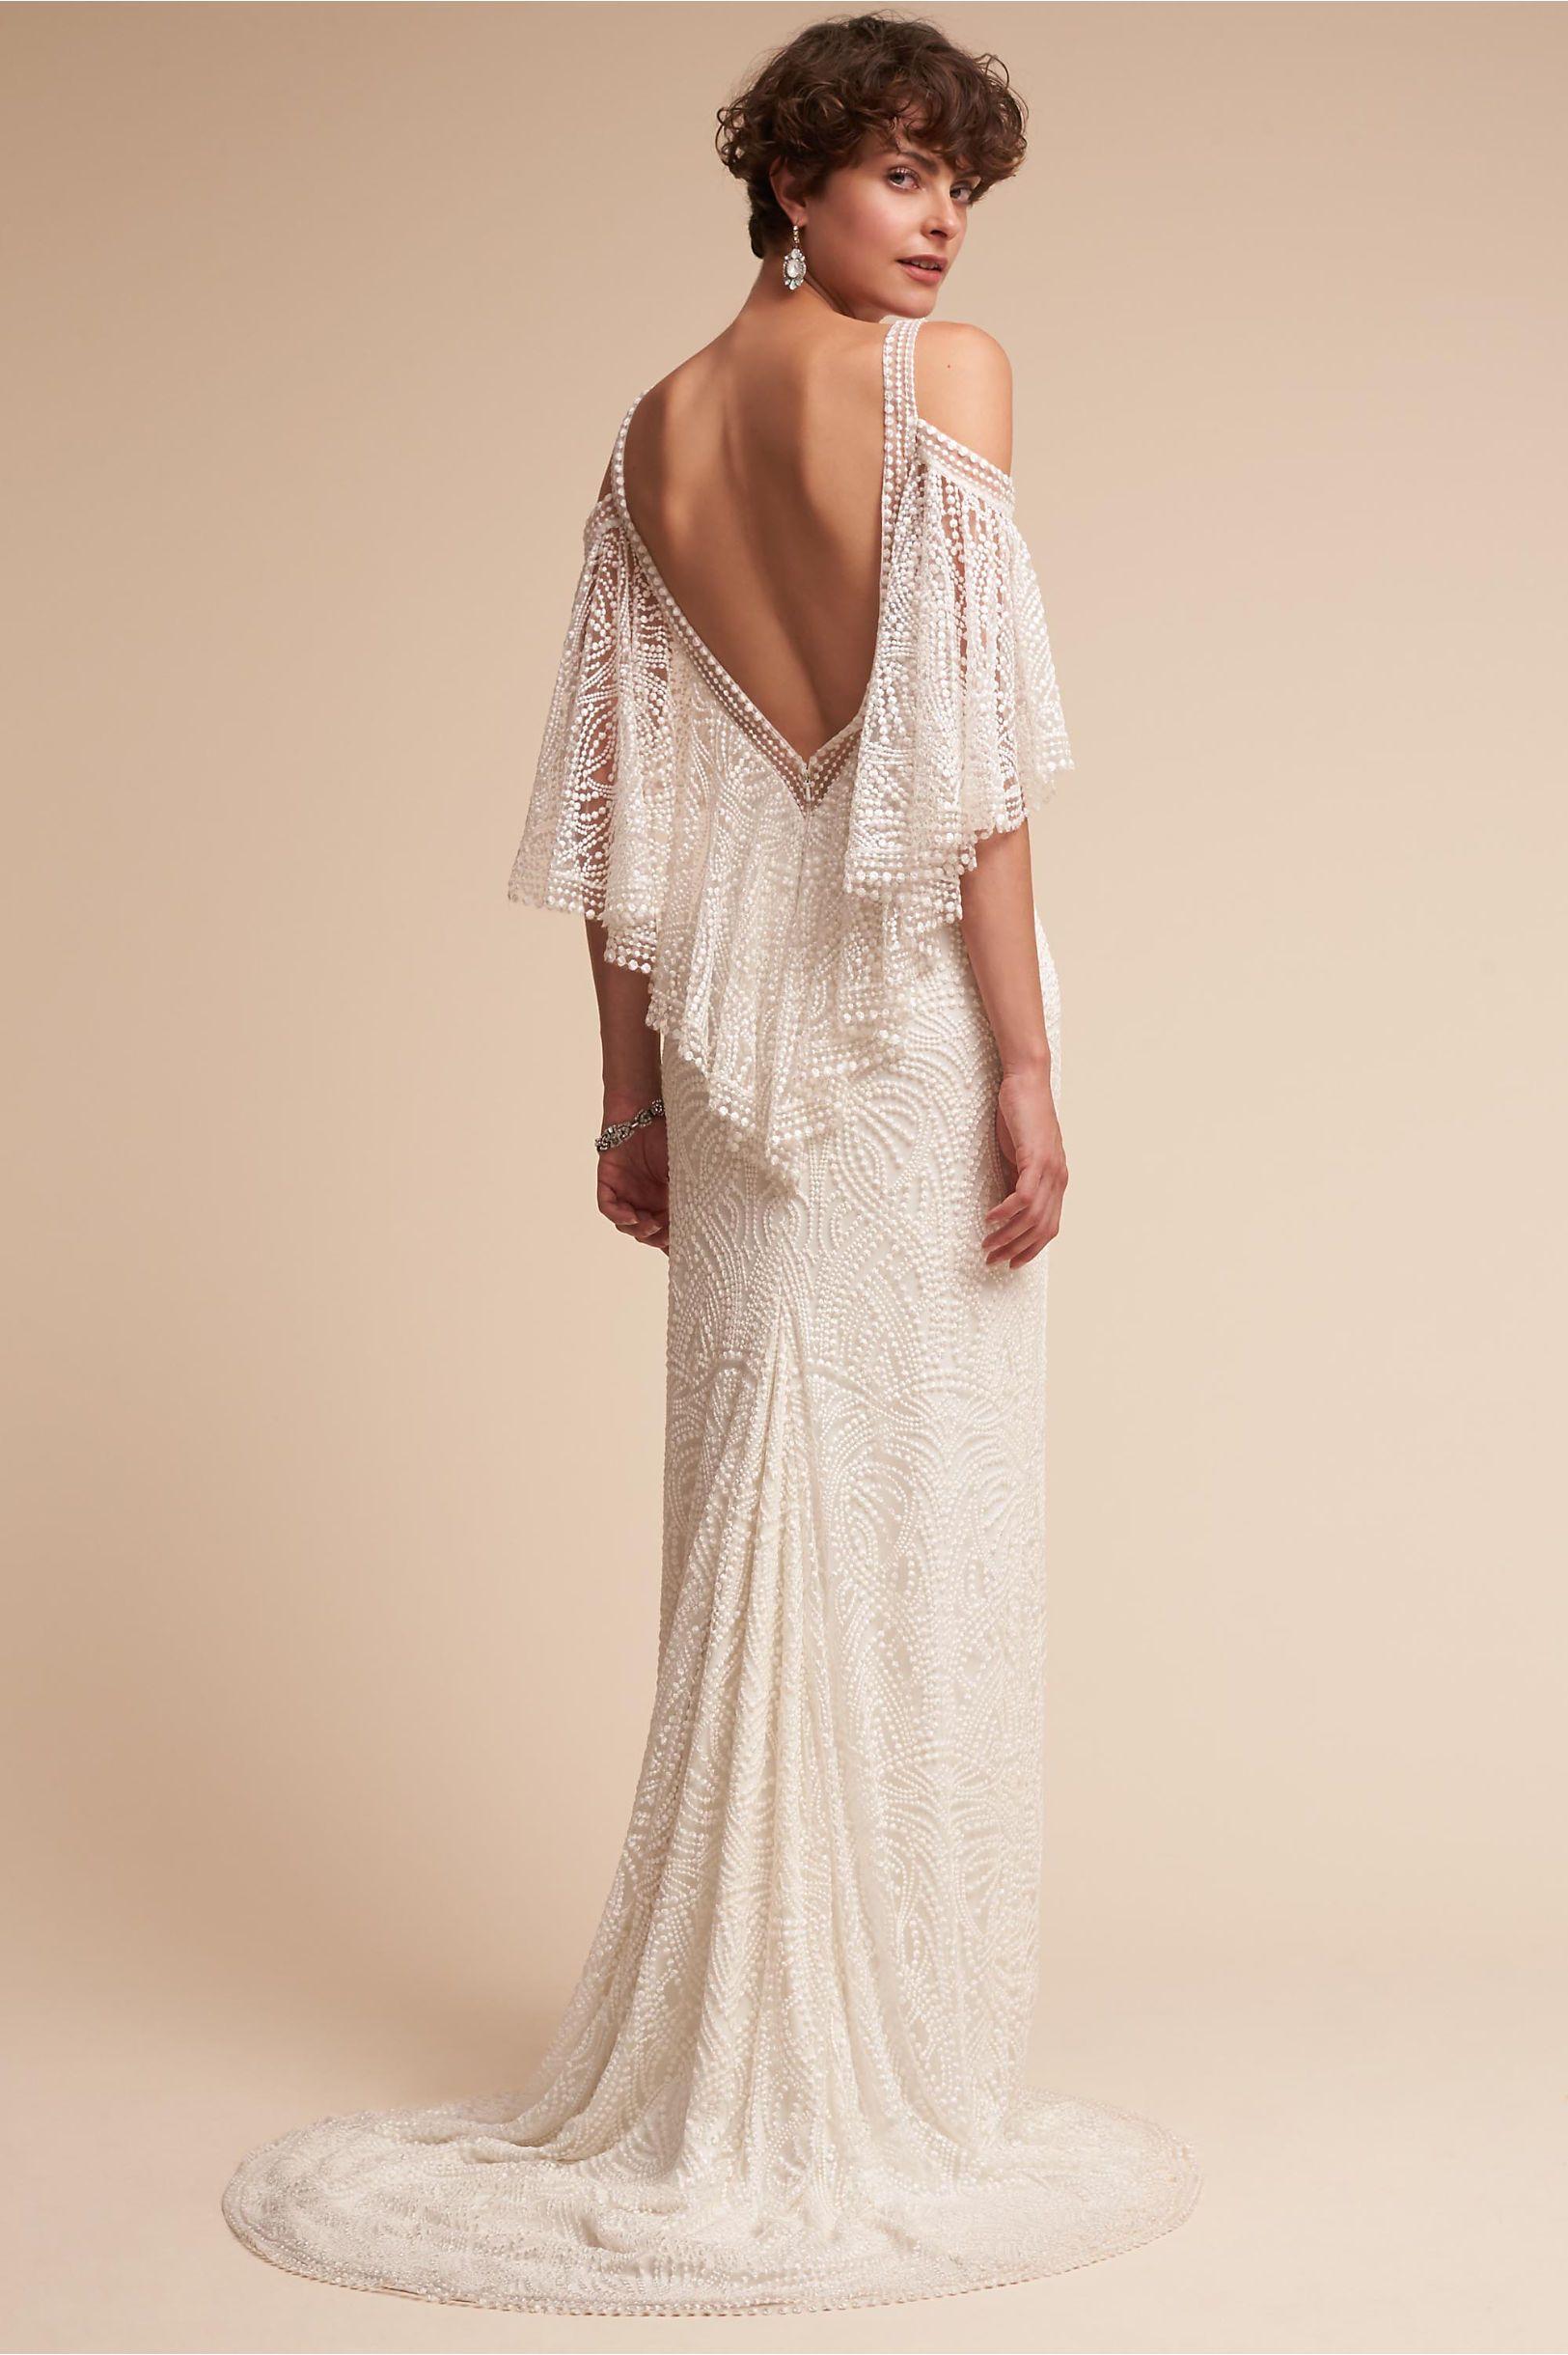 0e5cf8c5025cb BHLDN Copeland Gown Ivory in Bride